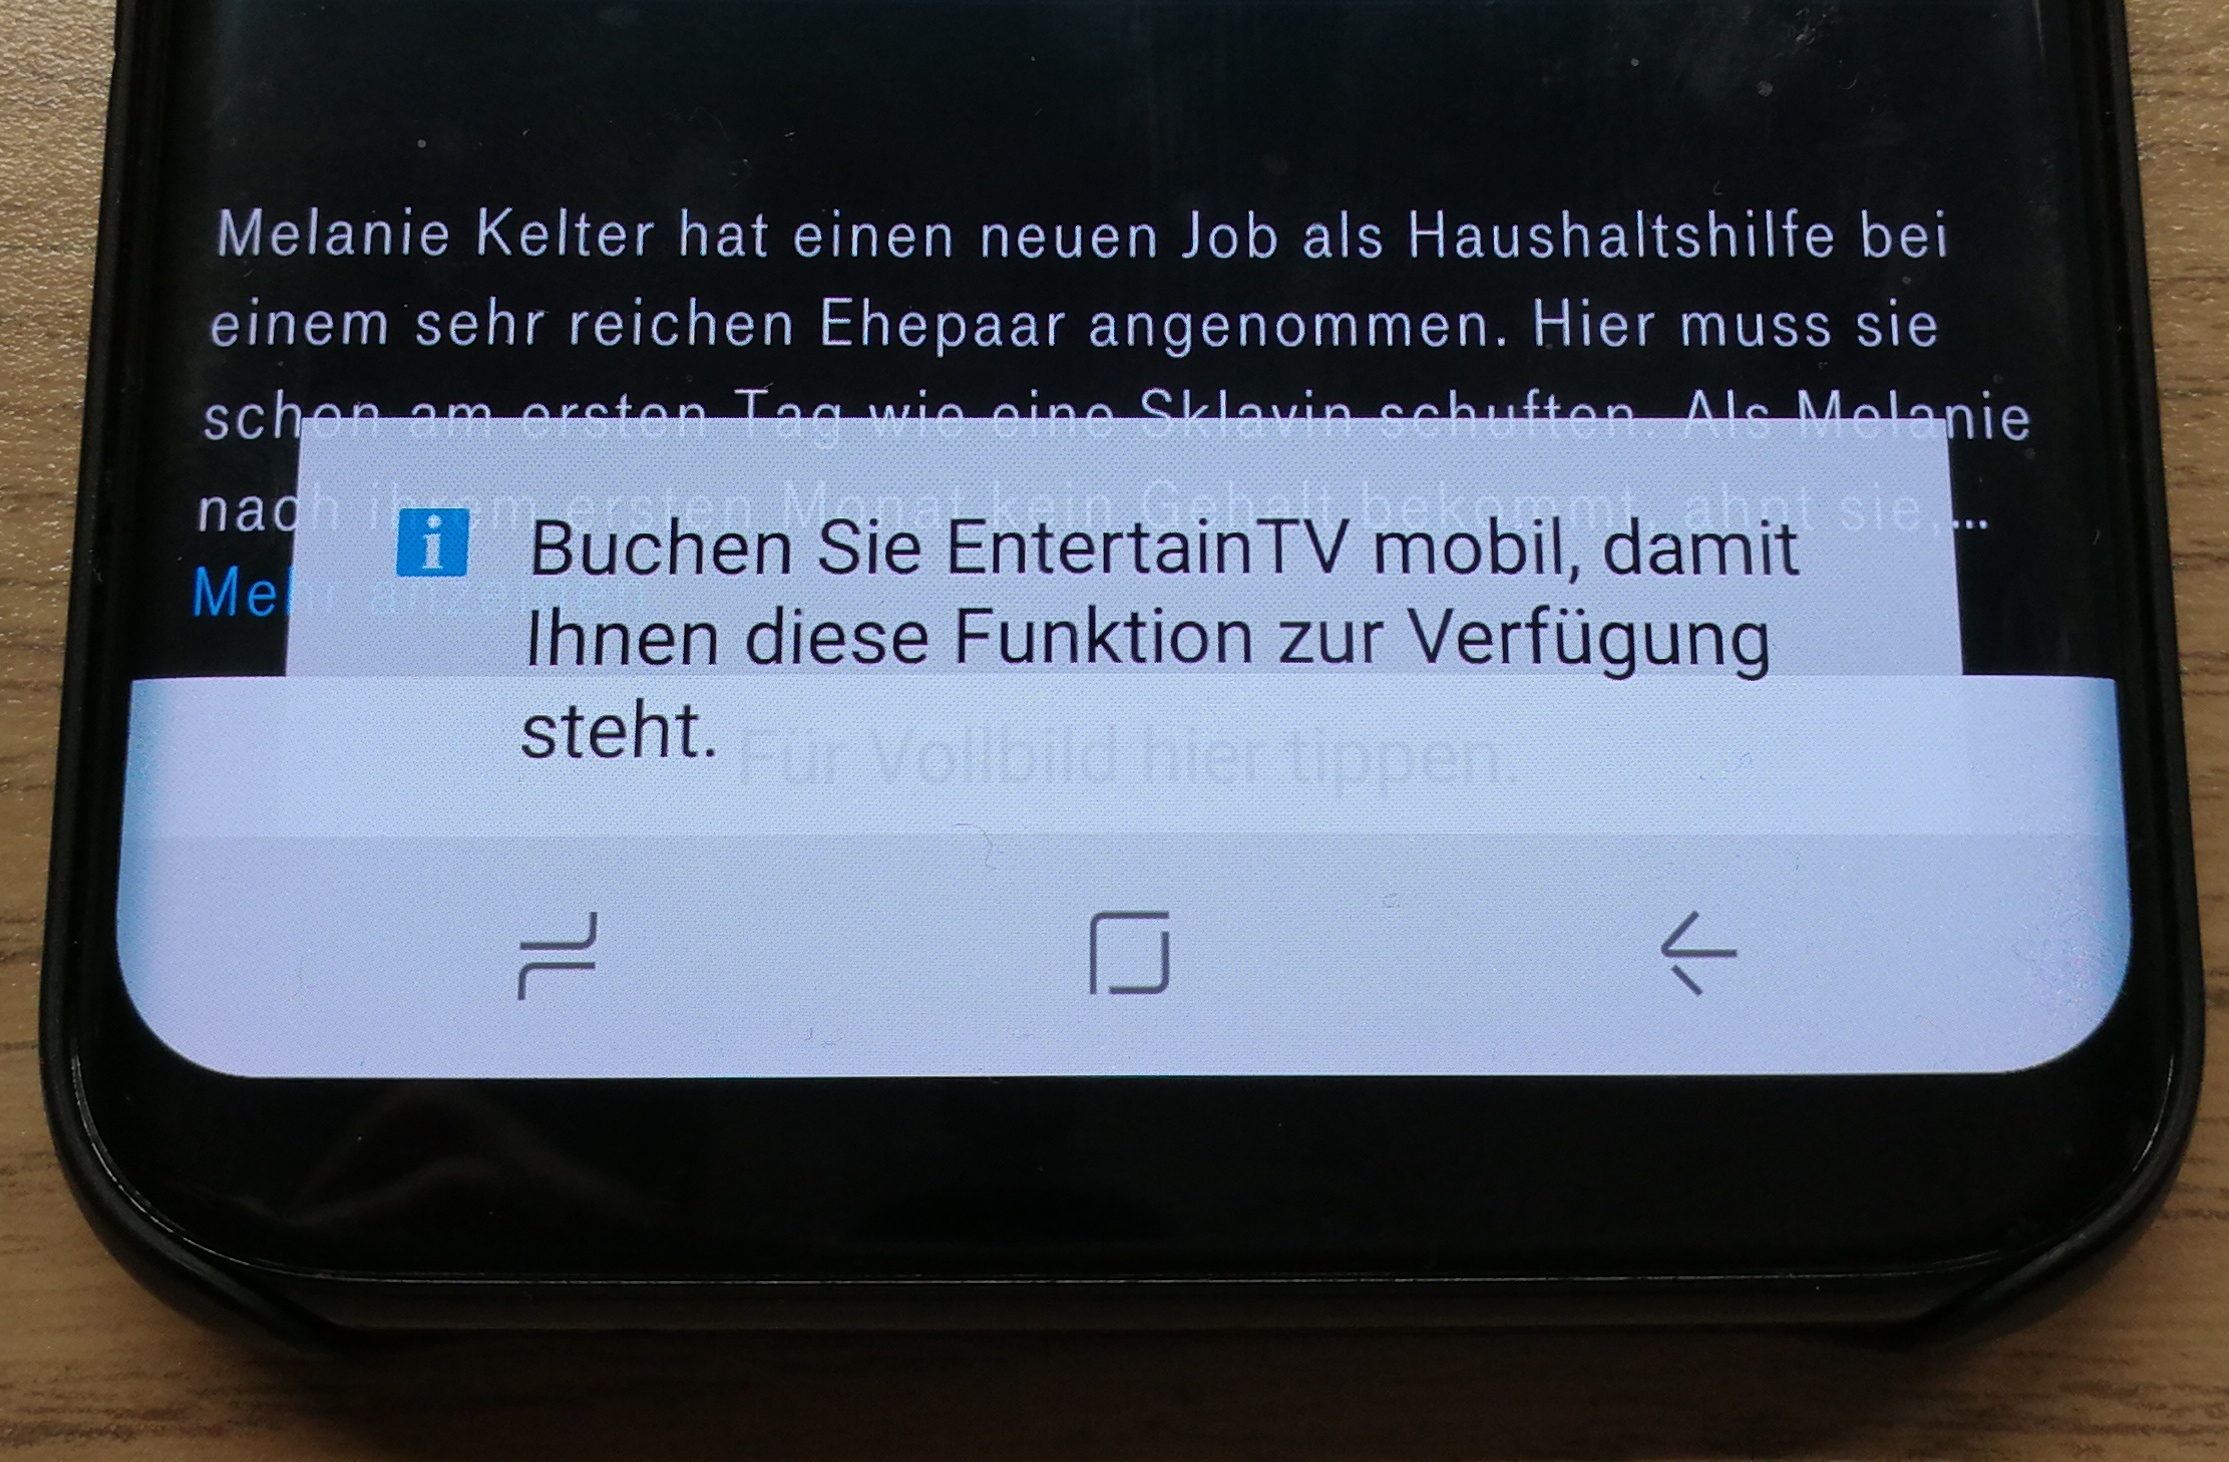 EntertainTV mobil nicht mehr verfügbar